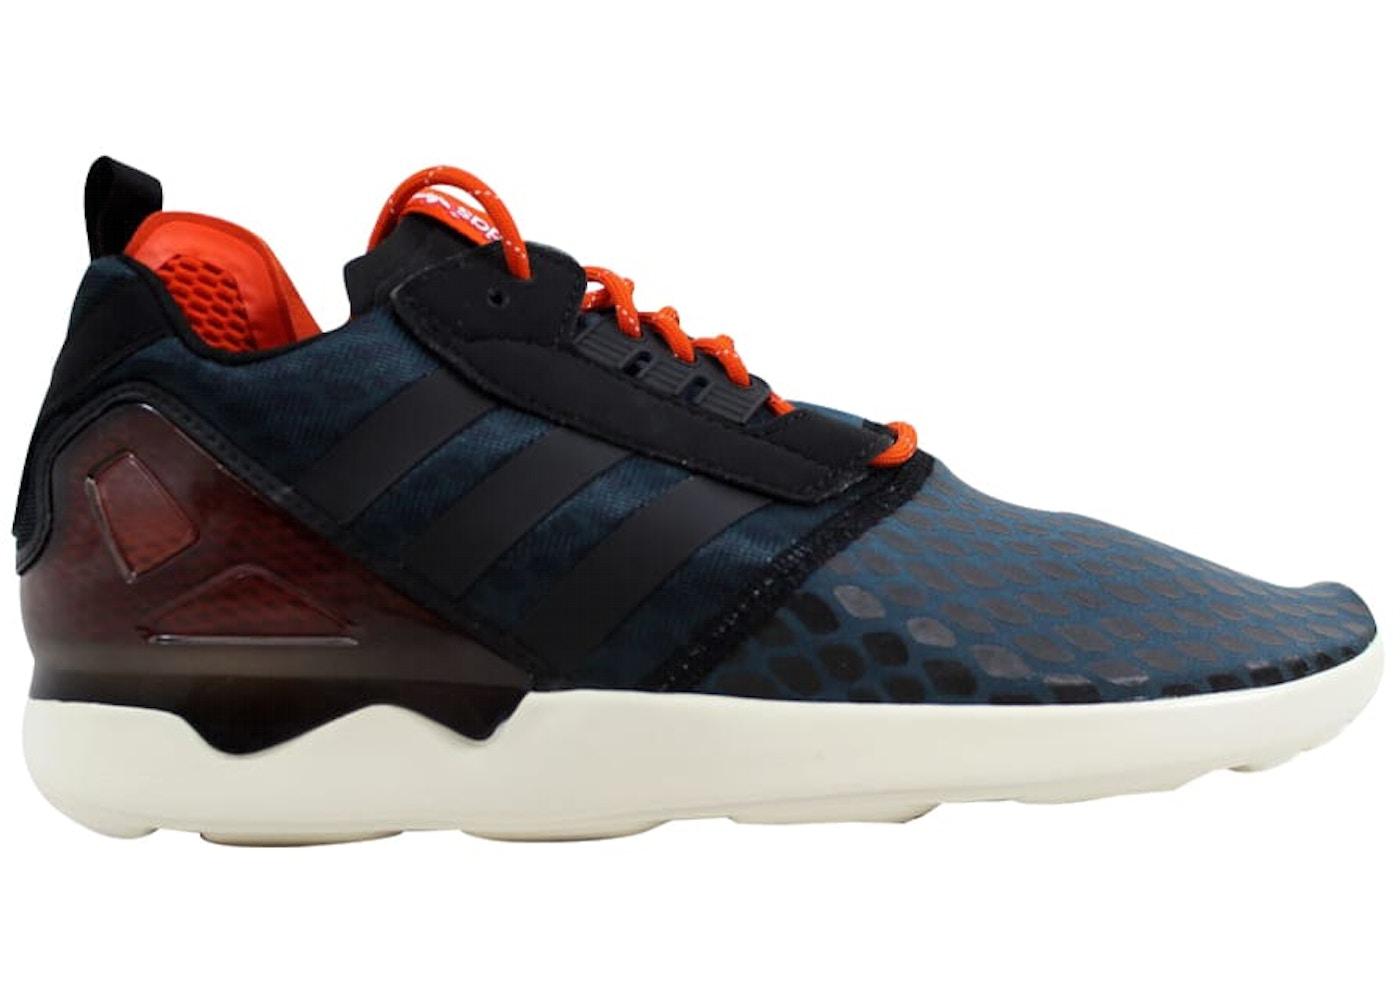 pretty nice 8df66 6c6e5 adidas ZX 8000 Boost Blue Black-Orange